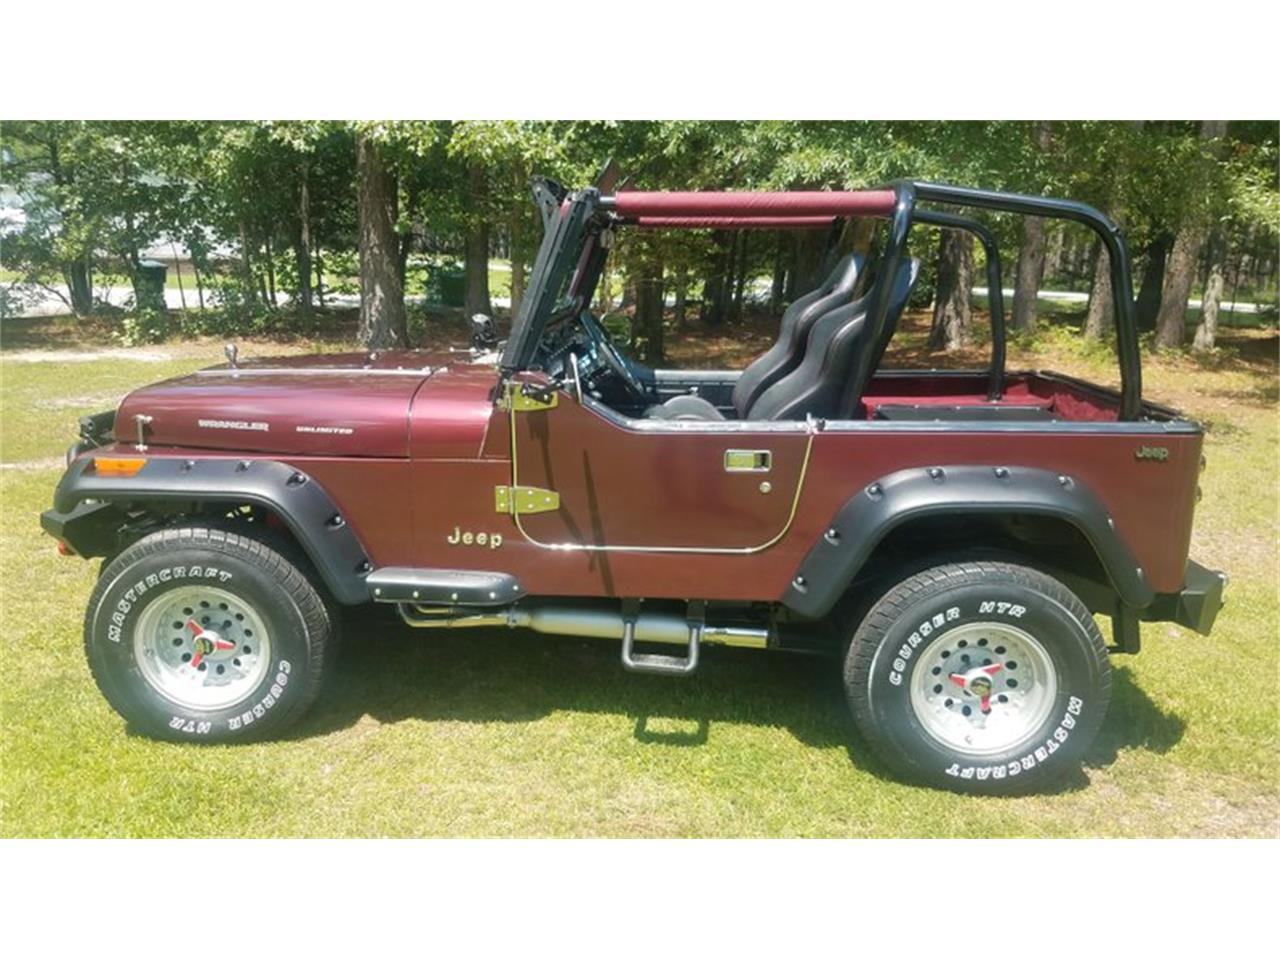 for sale at auction 1995 jeep wrangler in greensboro, north carolina cars - greensboro, nc at geebo